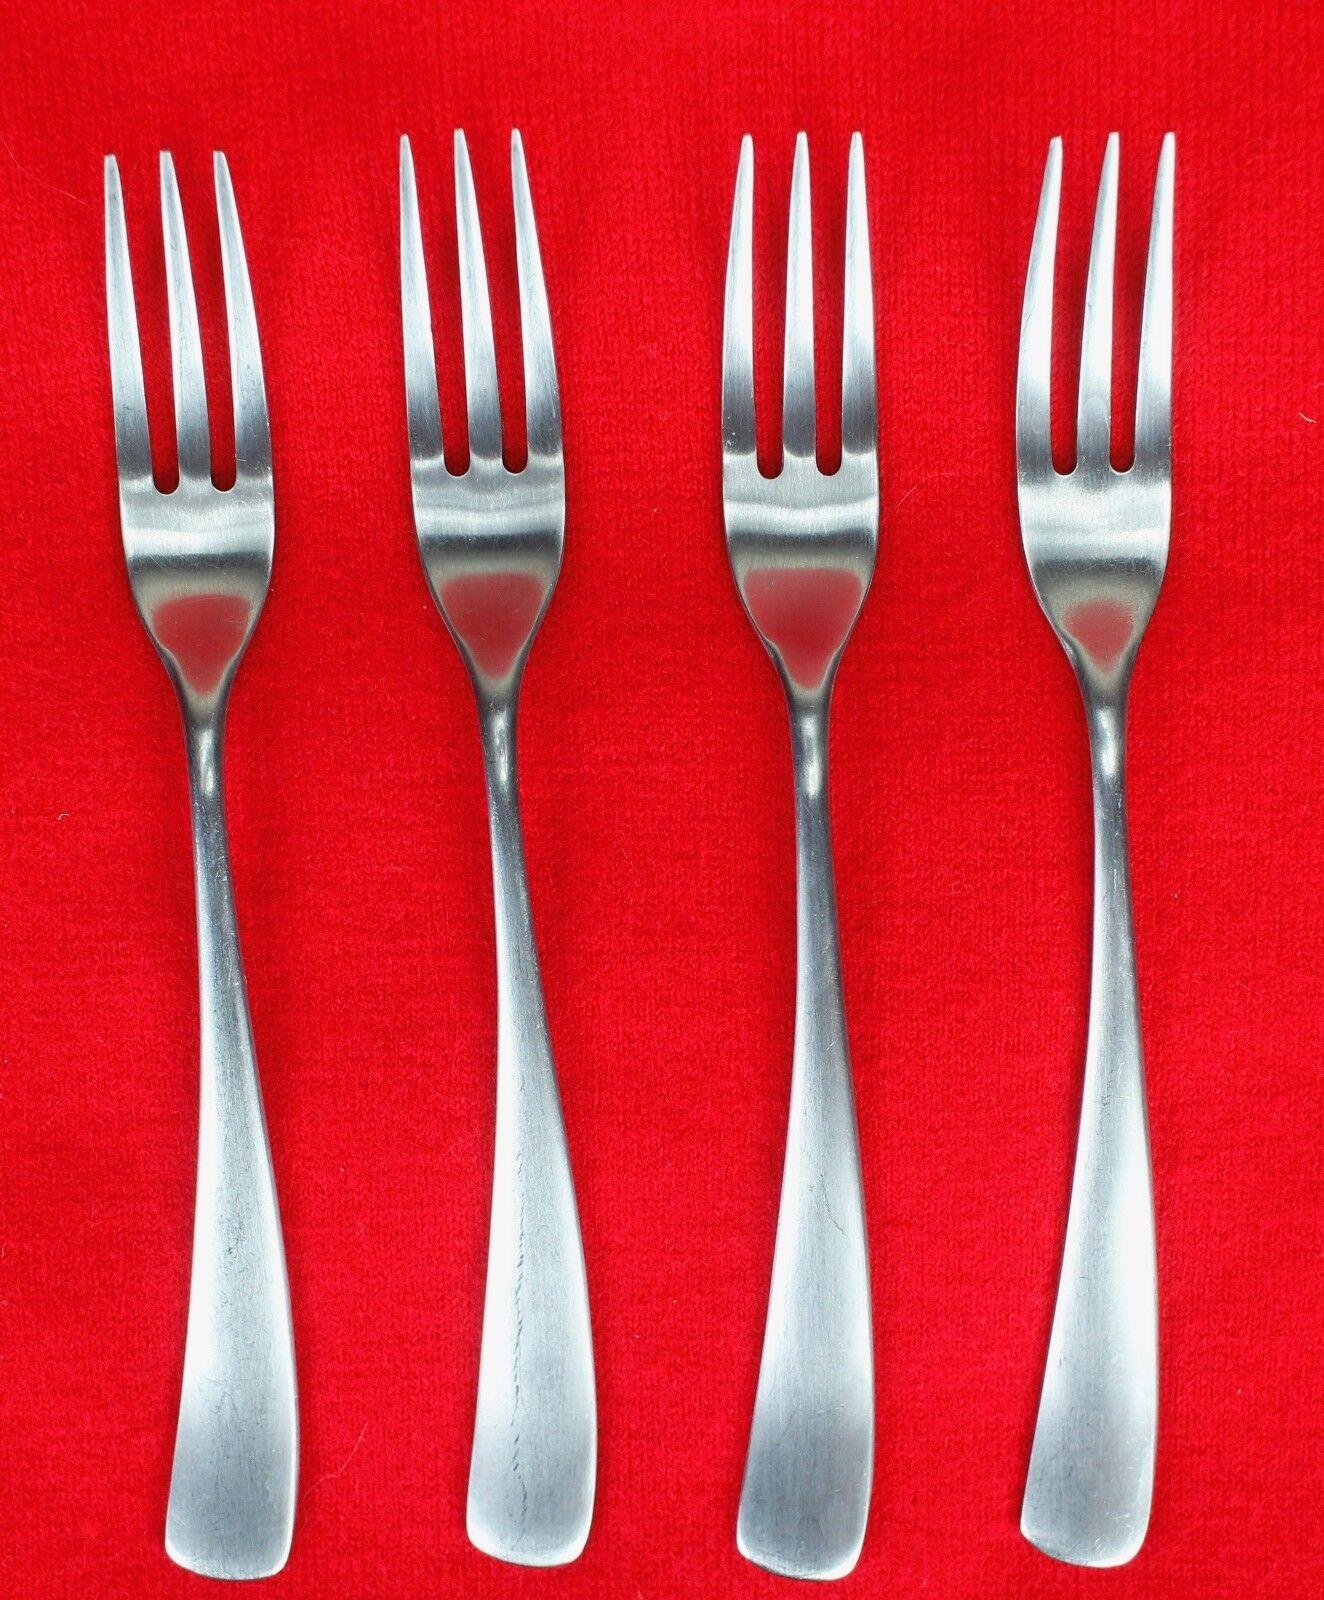 4X Salad Forks Studio William Larch-Satin Stainless Curved Flatware 7 3 8  Fork